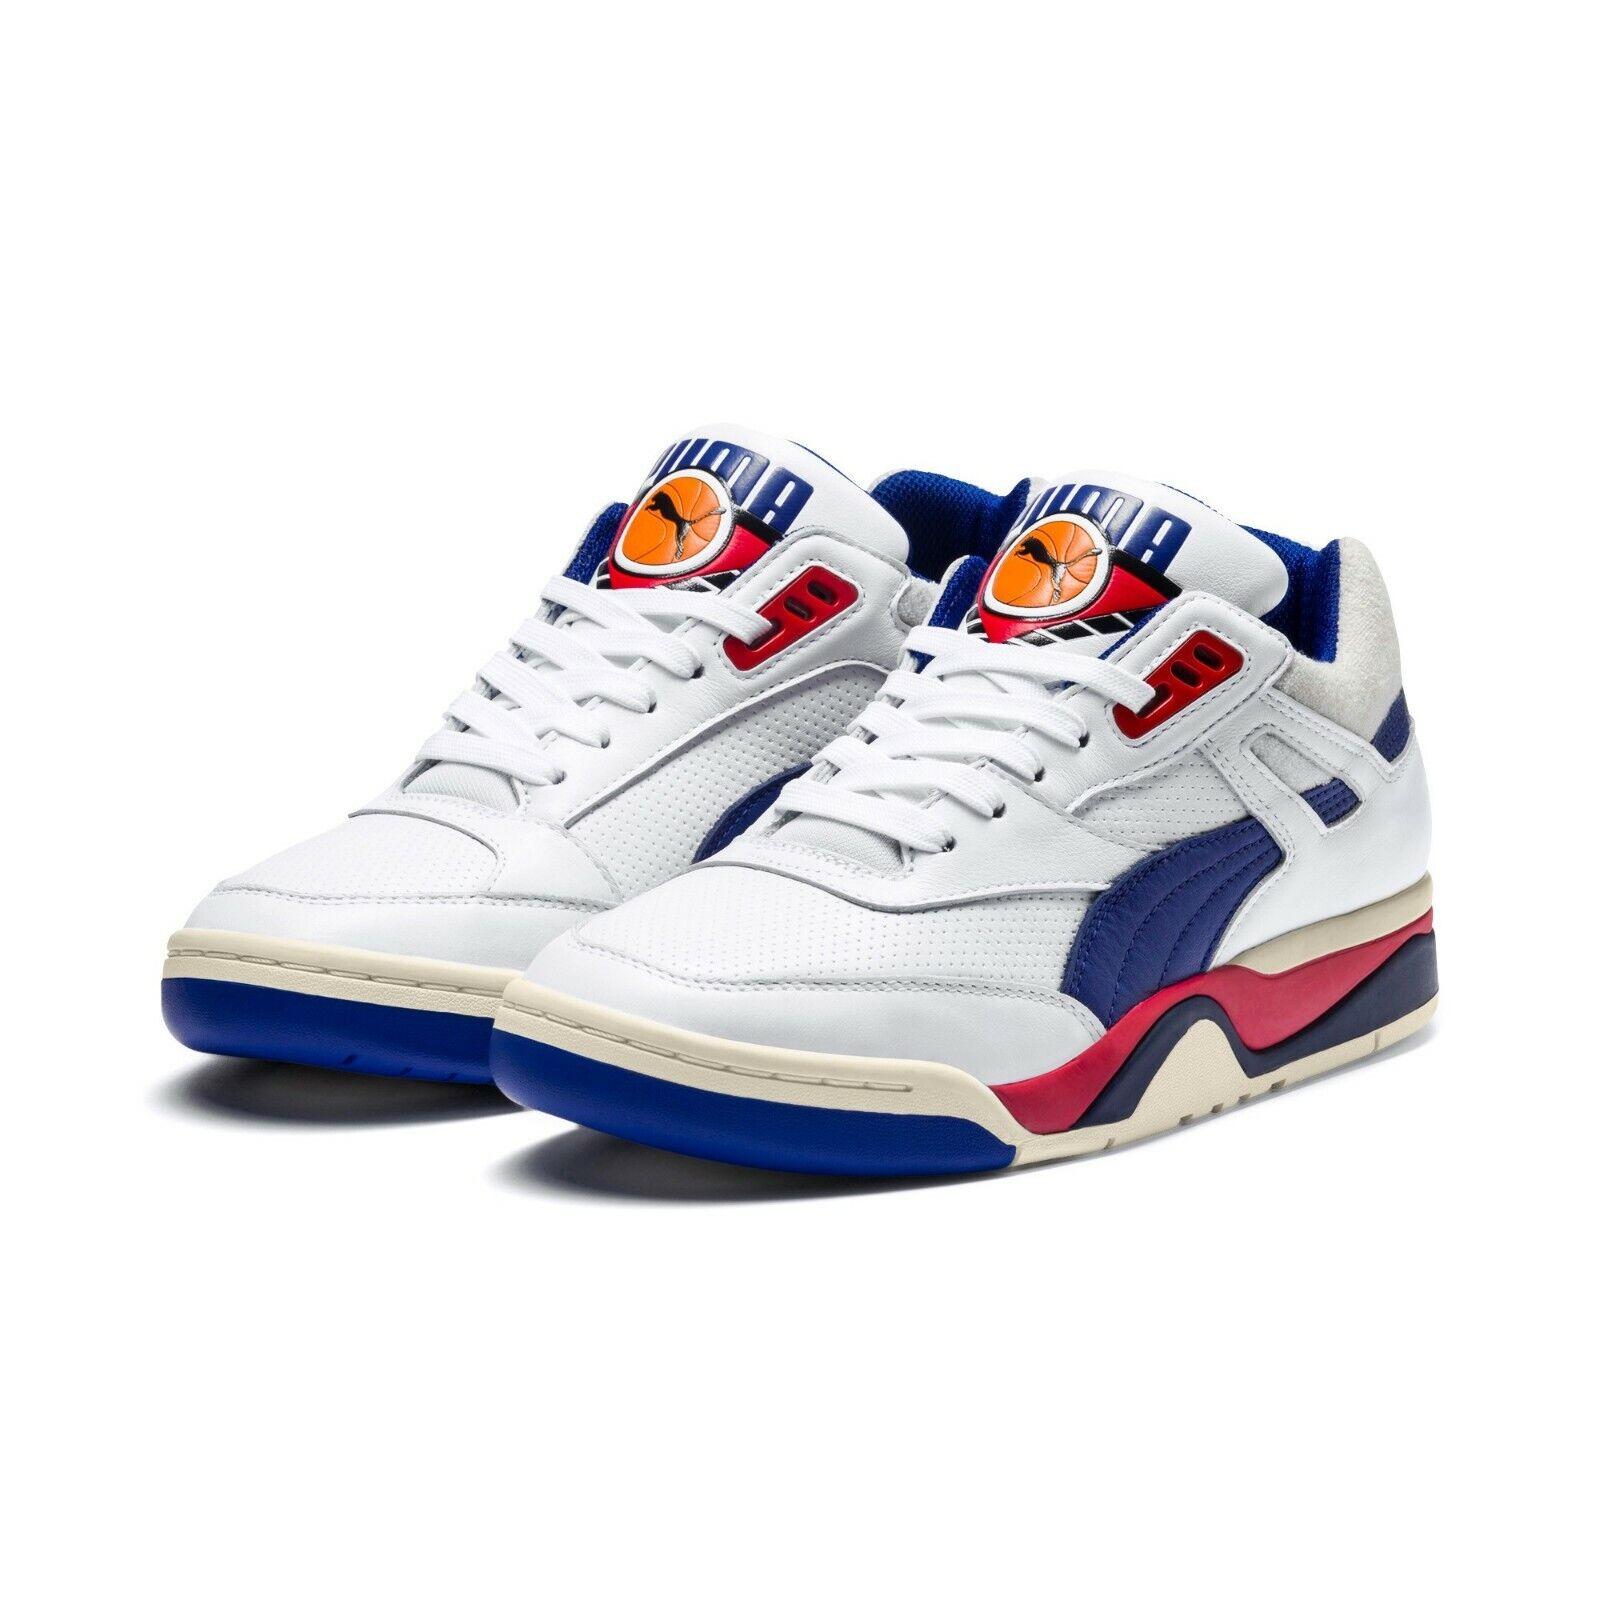 PUMA PALACE GUARD OG WHITE BIANCO shoes men SHOES SCHUHE shoes shoes